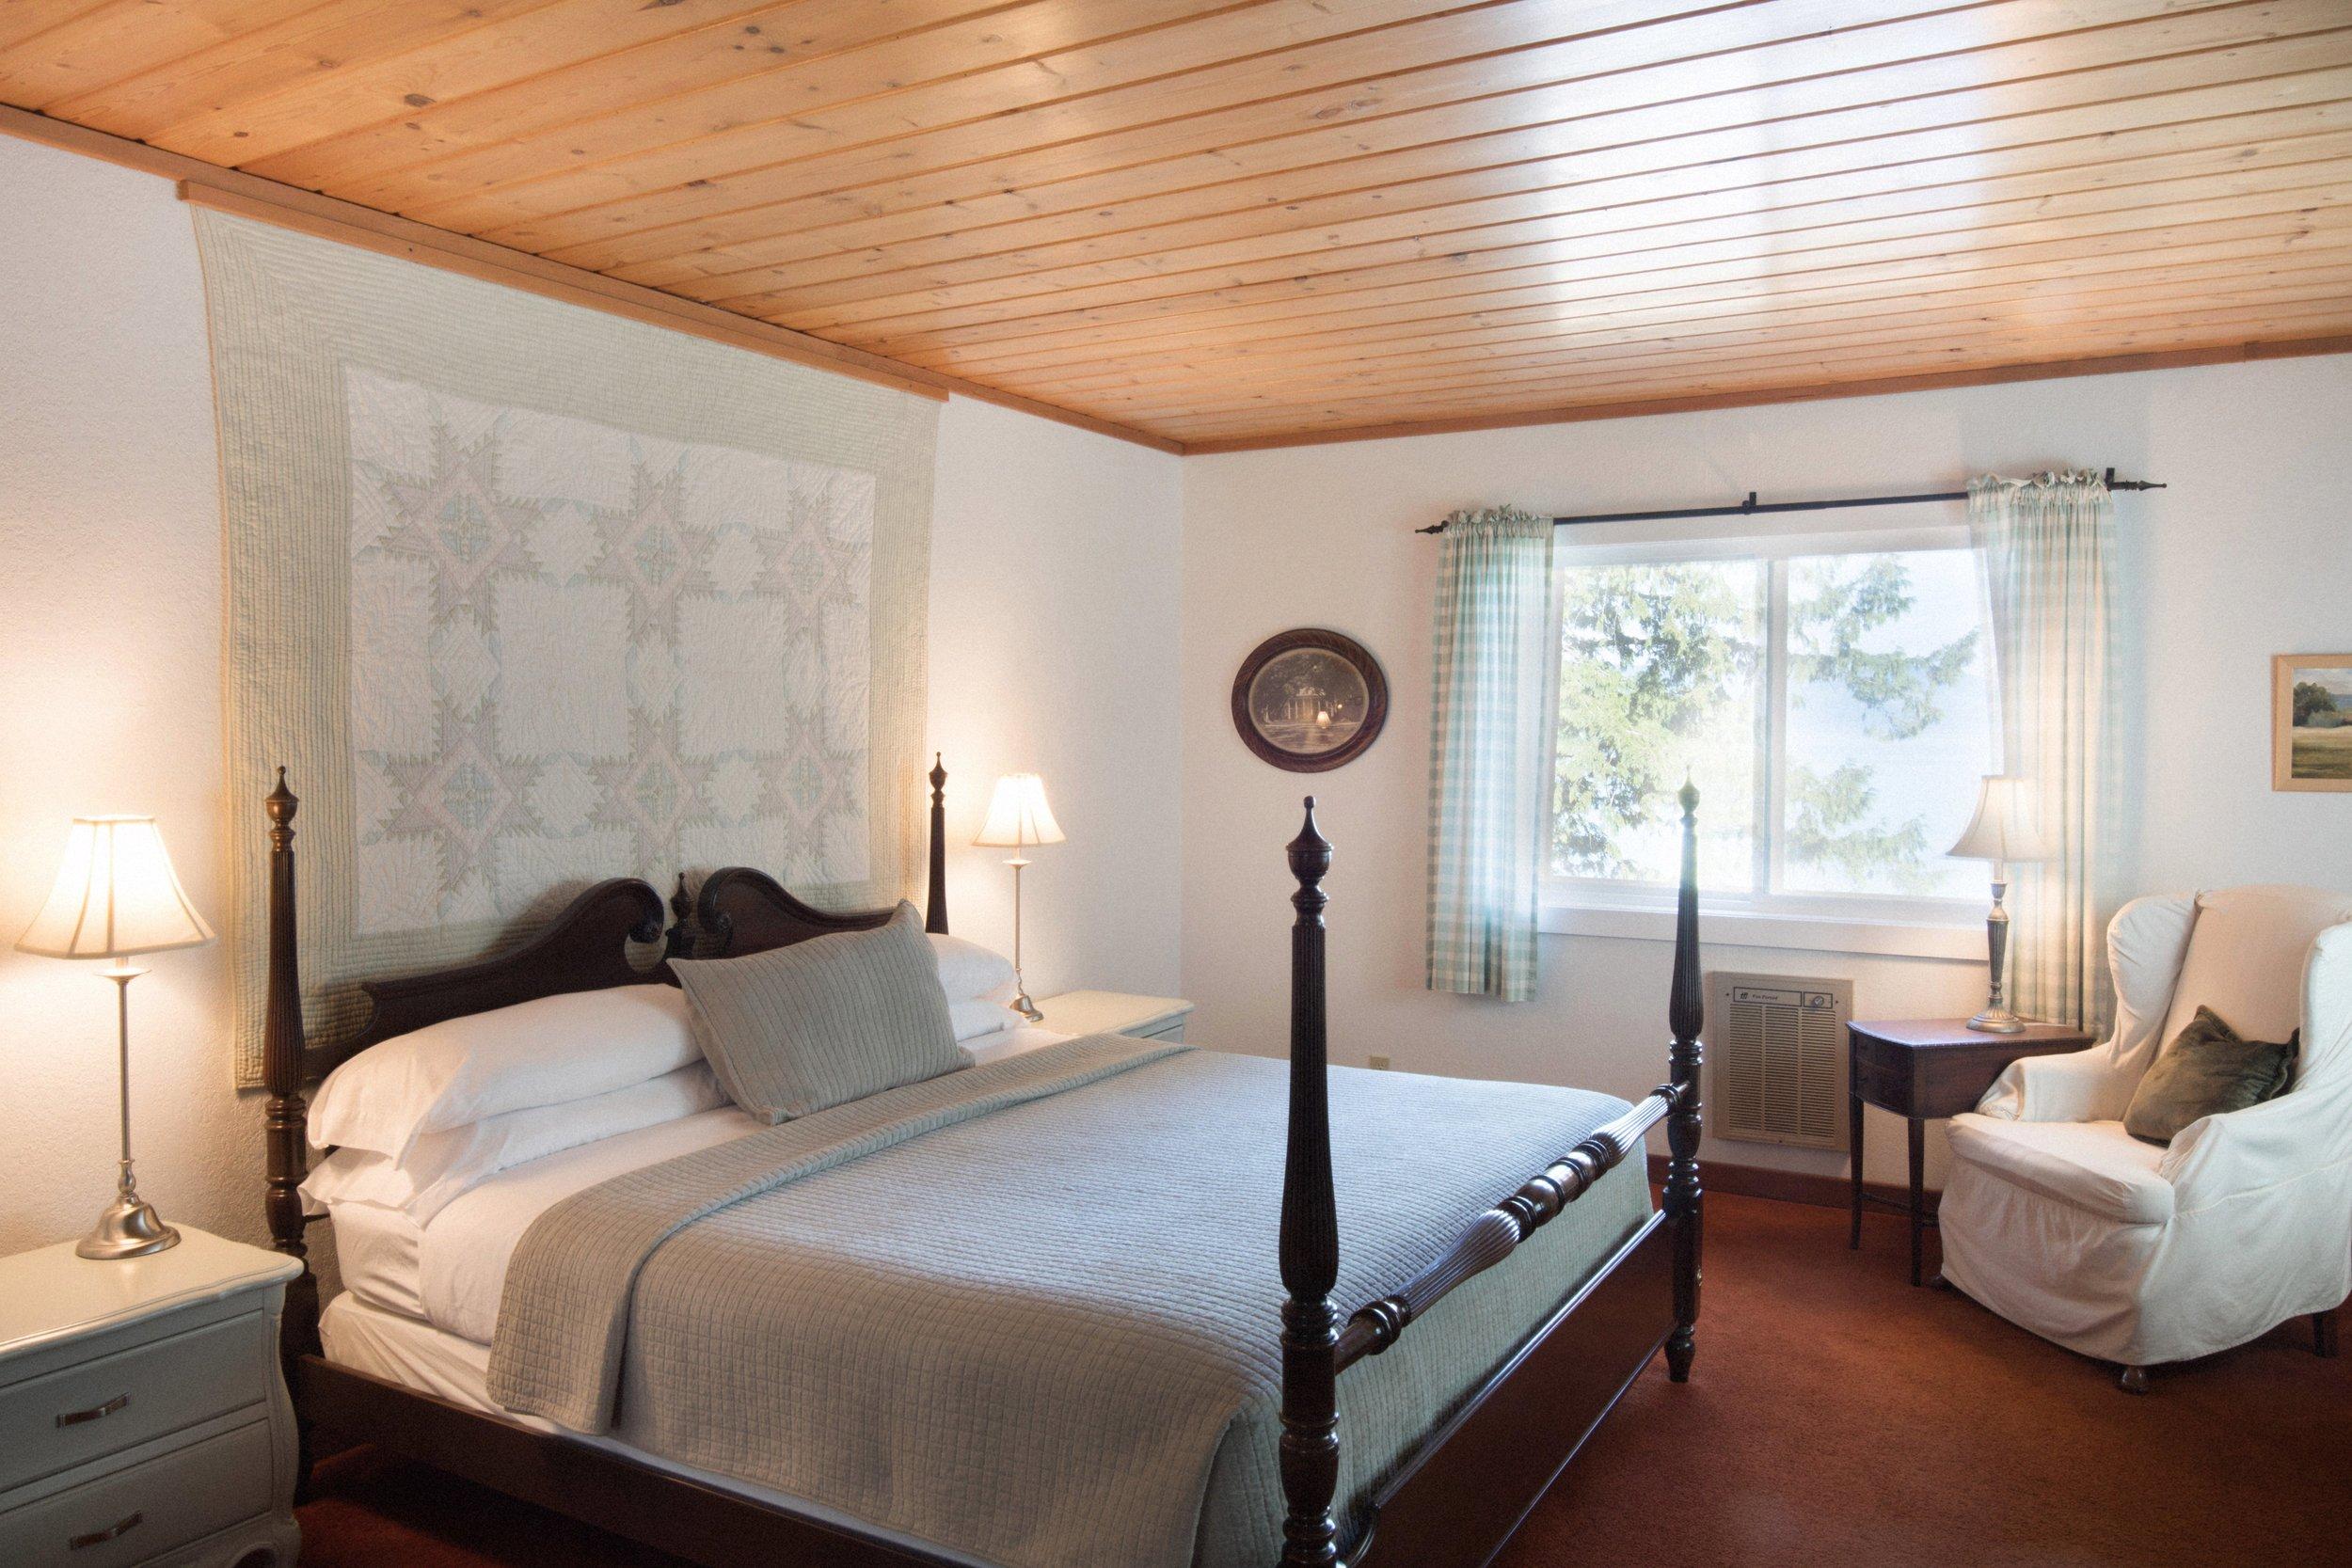 190329-Beach-House-Bedroom-1-0001-EX.jpg